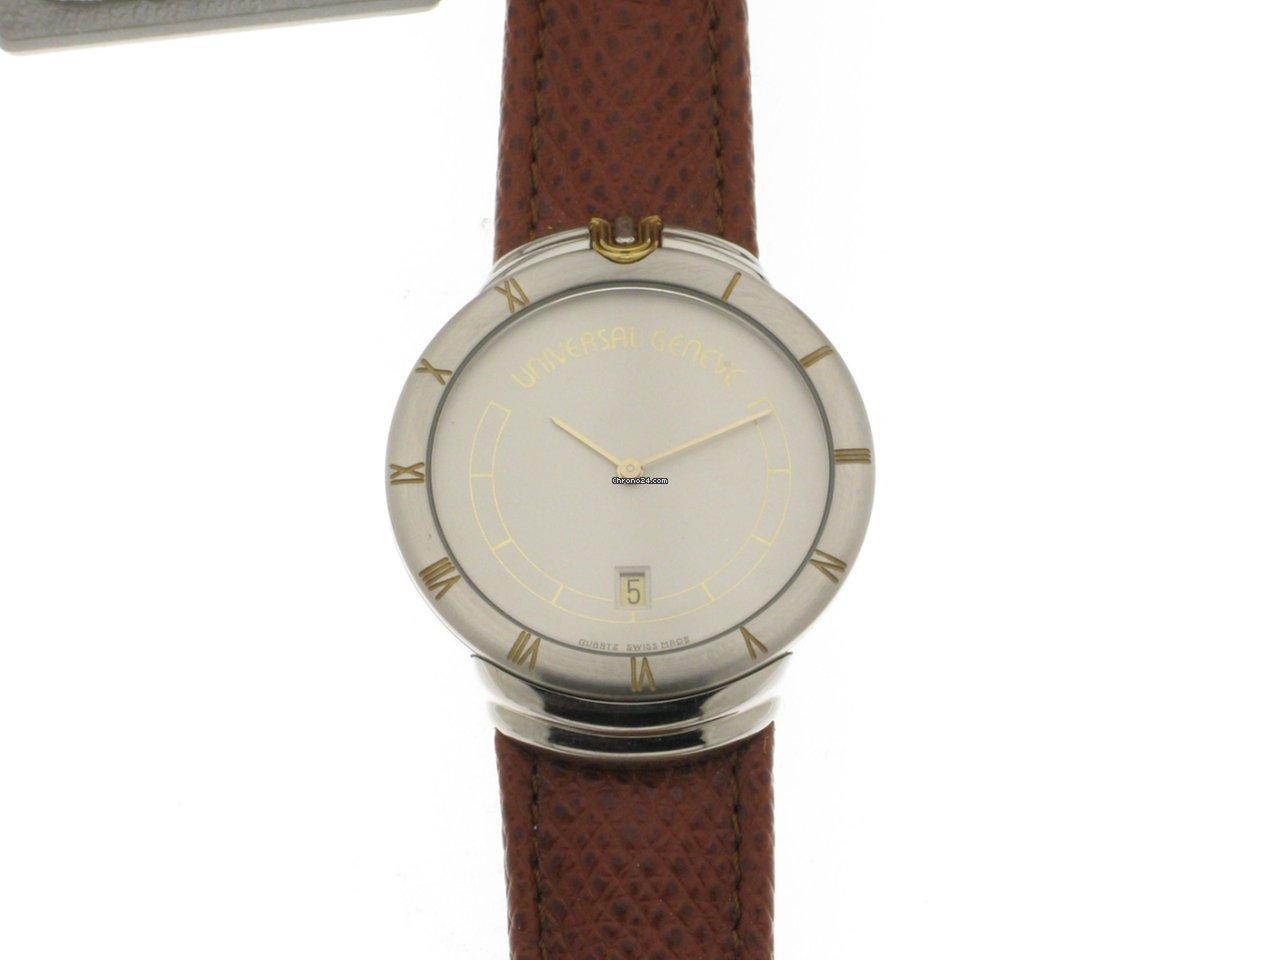 d5212e9f222 Preços de relógios Universal Genève